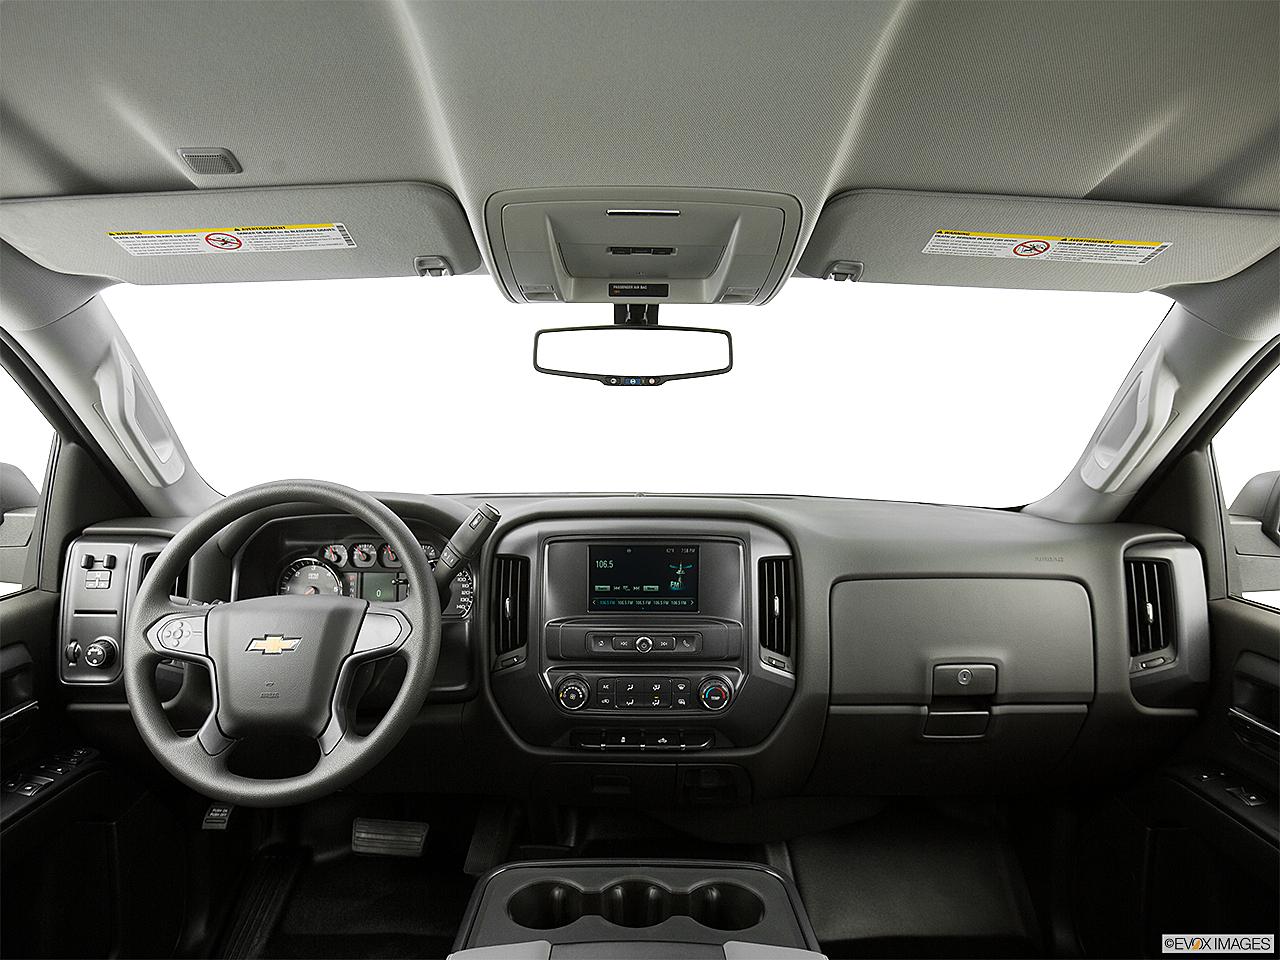 2016 chevrolet silverado 2500hd 4x4 work truck 2dr regular cab lb research groovecar. Black Bedroom Furniture Sets. Home Design Ideas